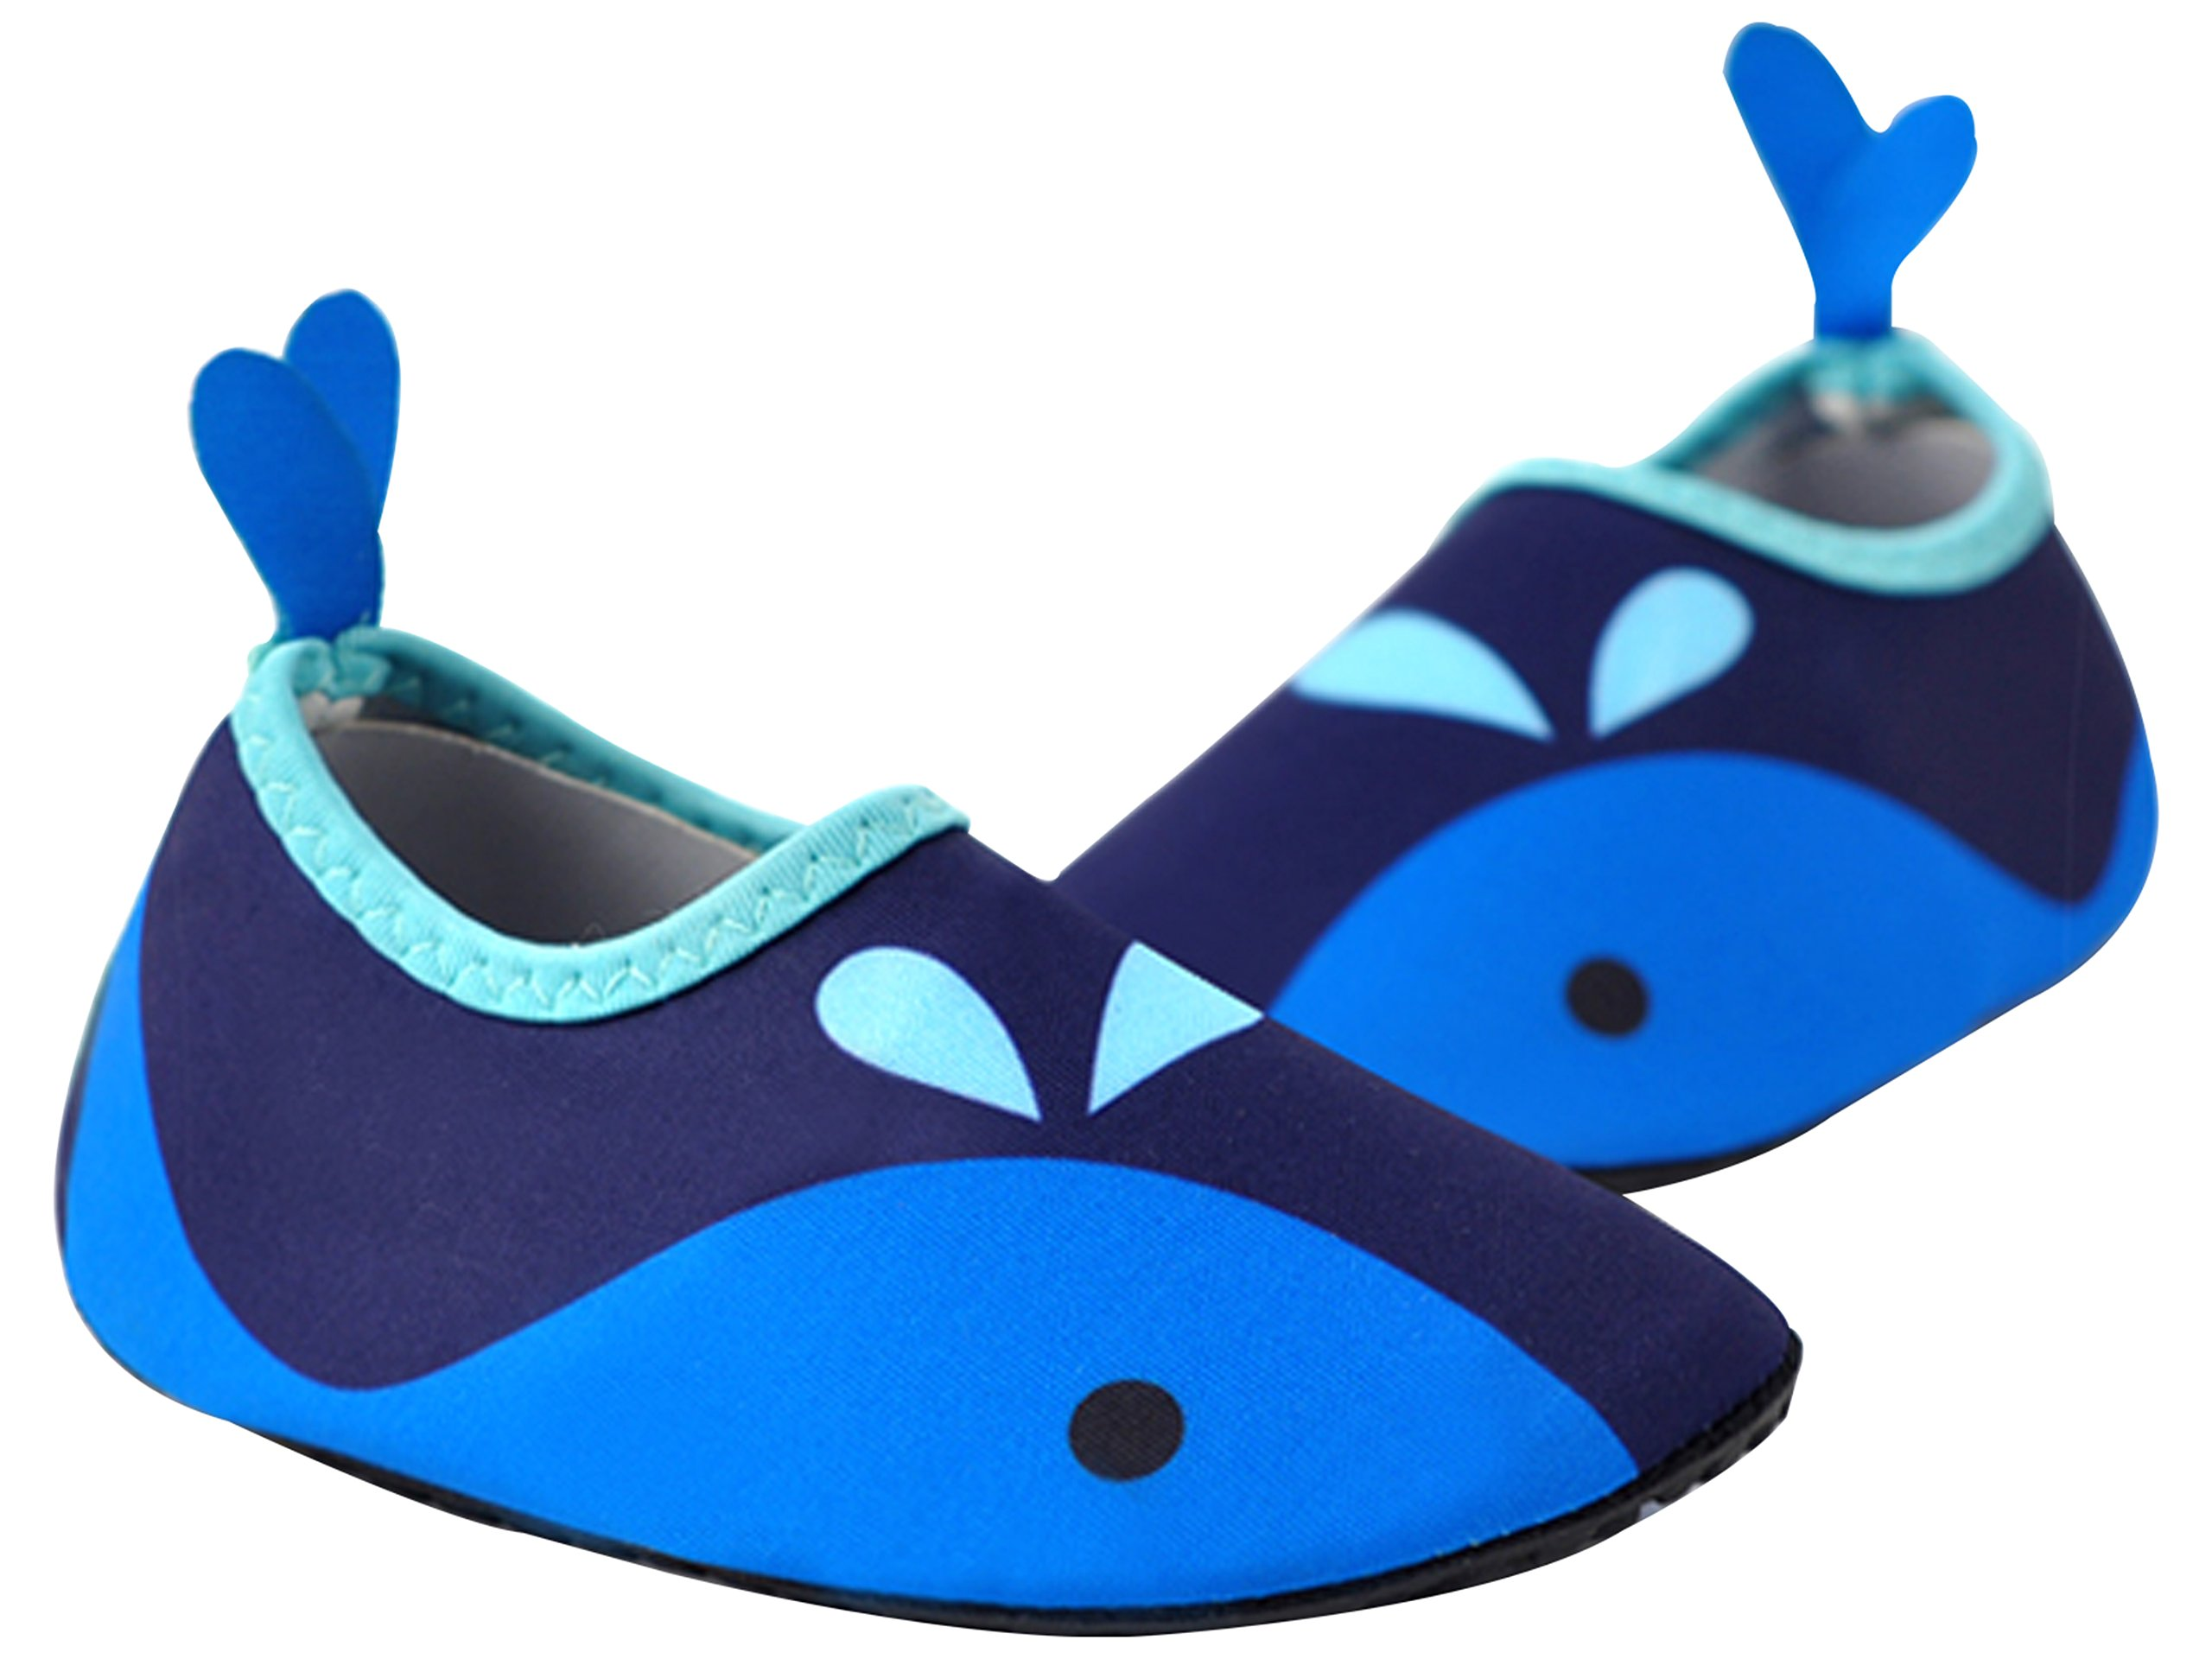 Ozkiz Boys Penguin Aqua Sock Water Skin Shoes Blue Small